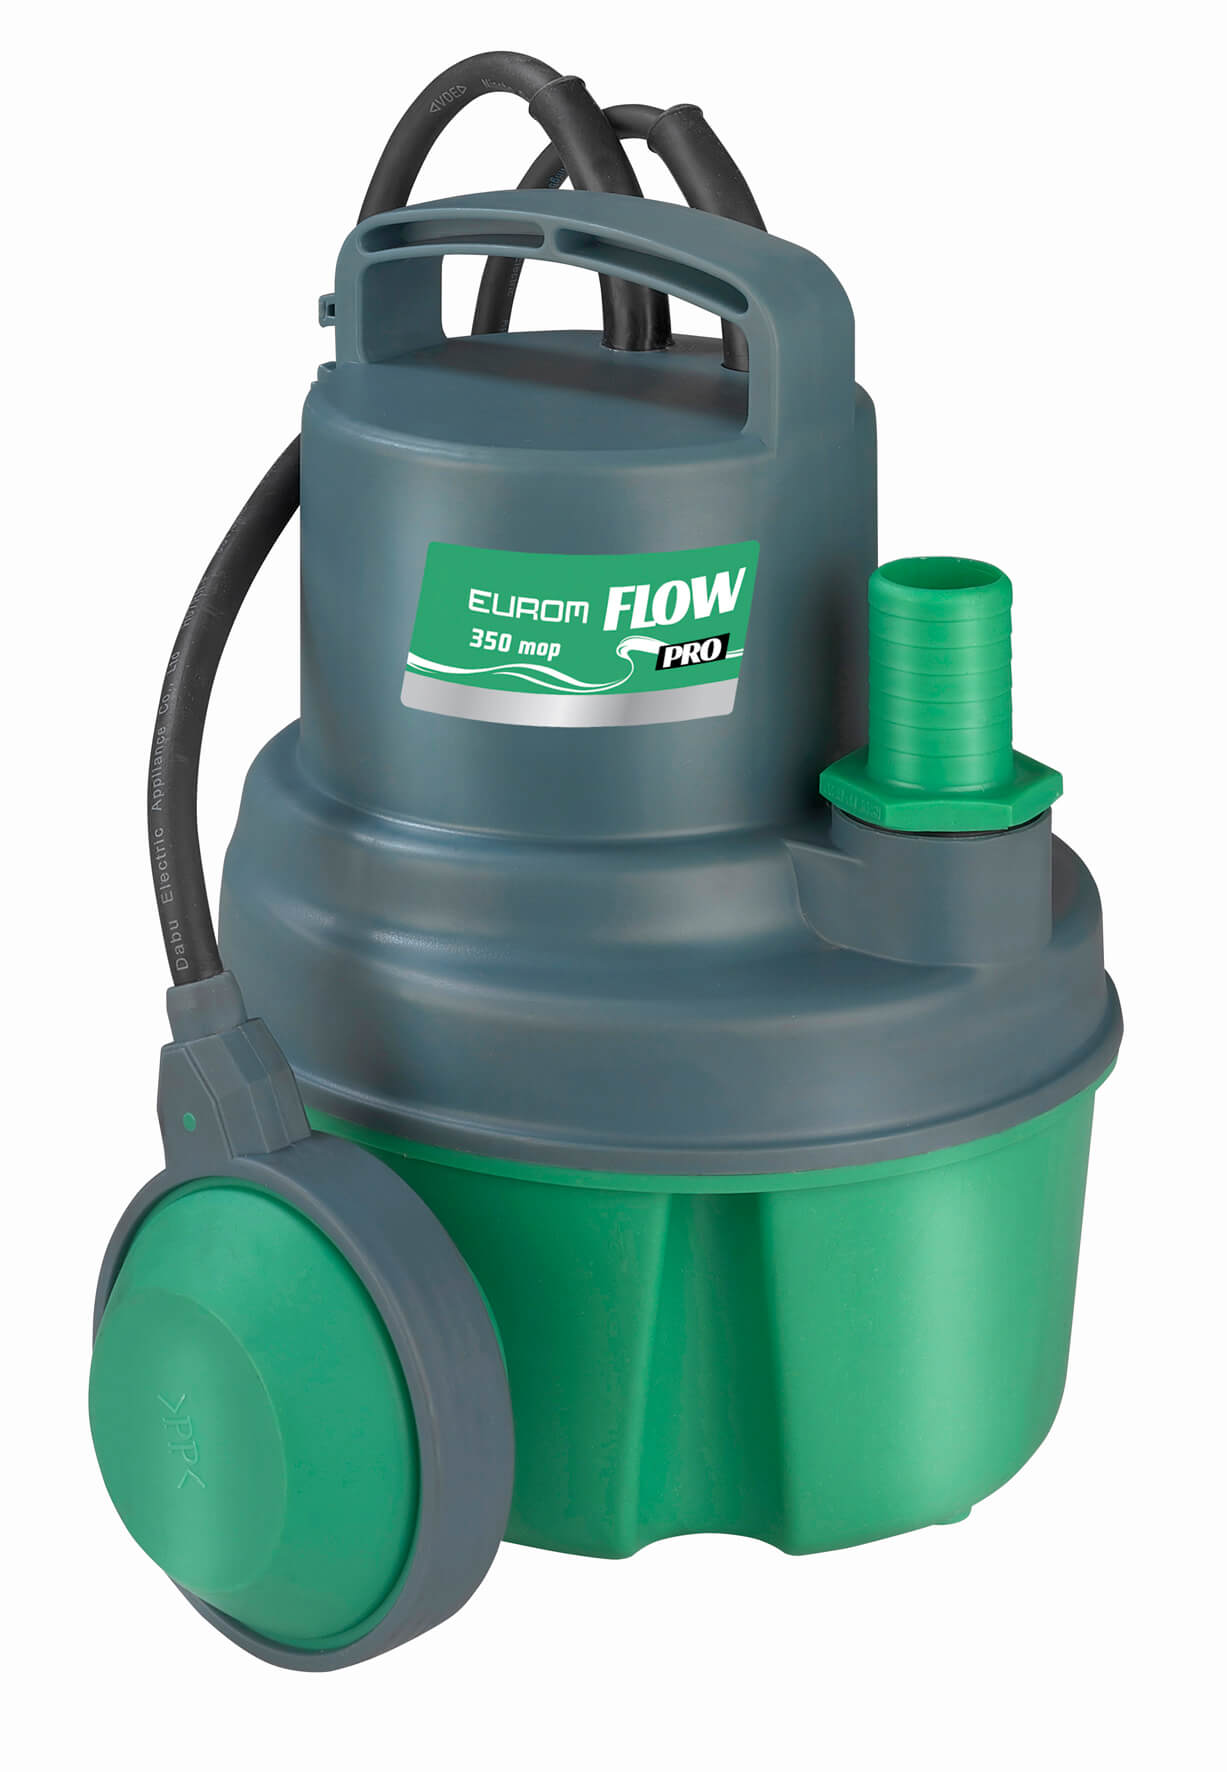 Eurom Flow Pro 350 mop schoonwaterpomp 350W | Dompelpomp | Dweilpomp